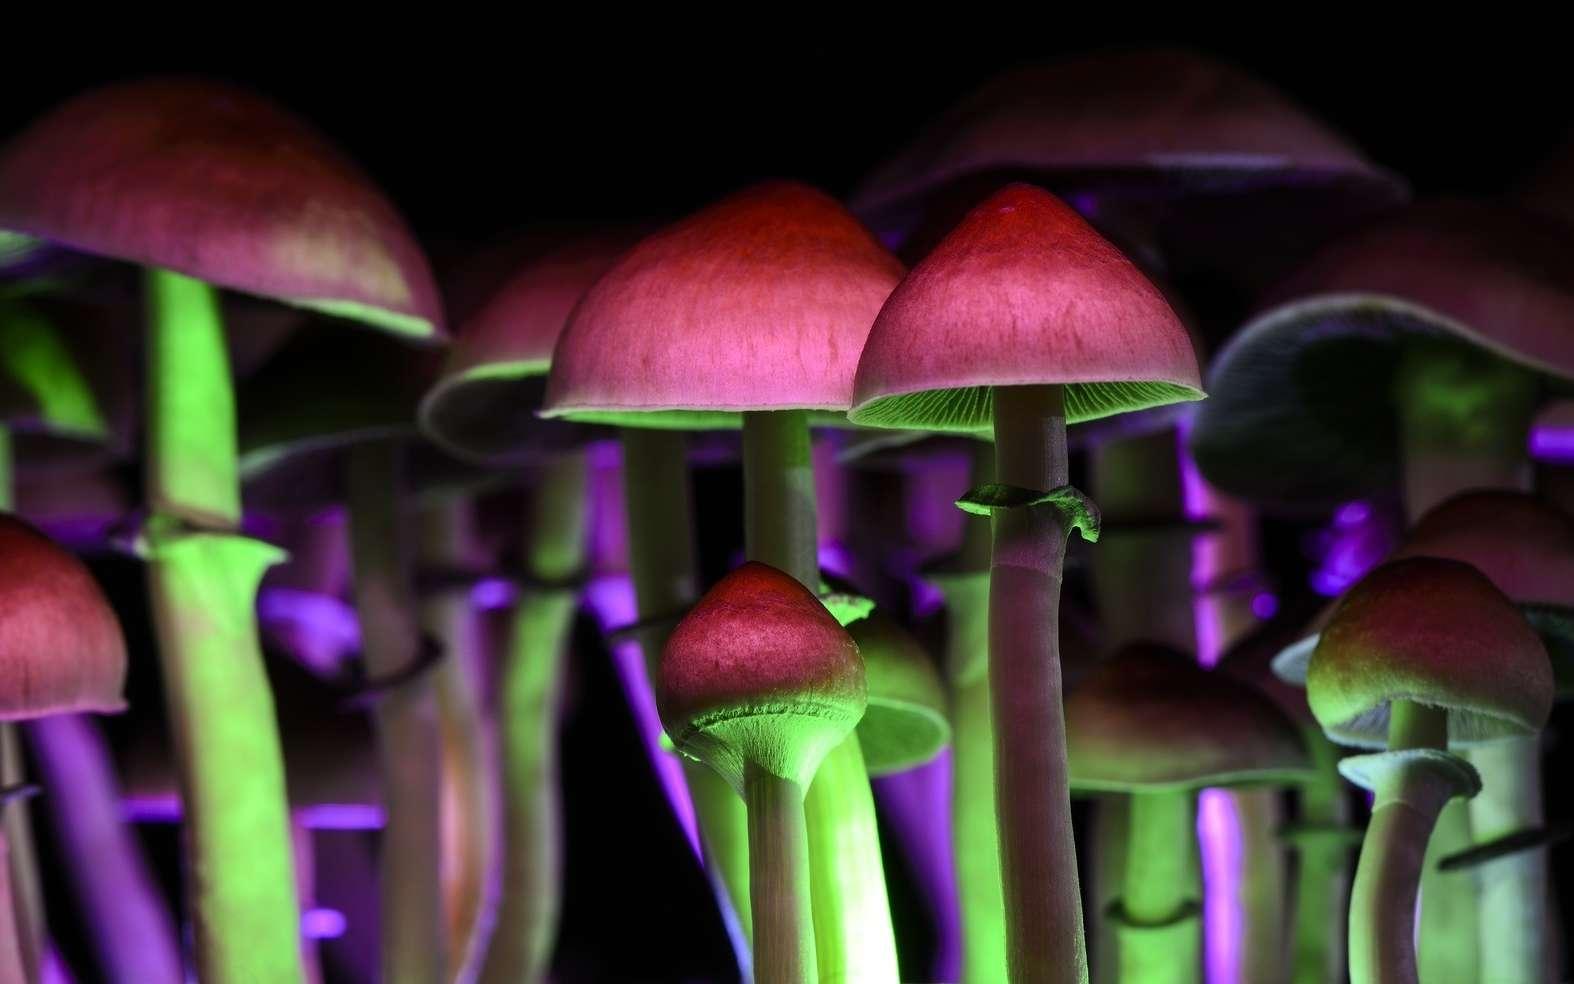 À quoi servent les champignons hallucinogènes dans la nature ? © Martina, Fotolia